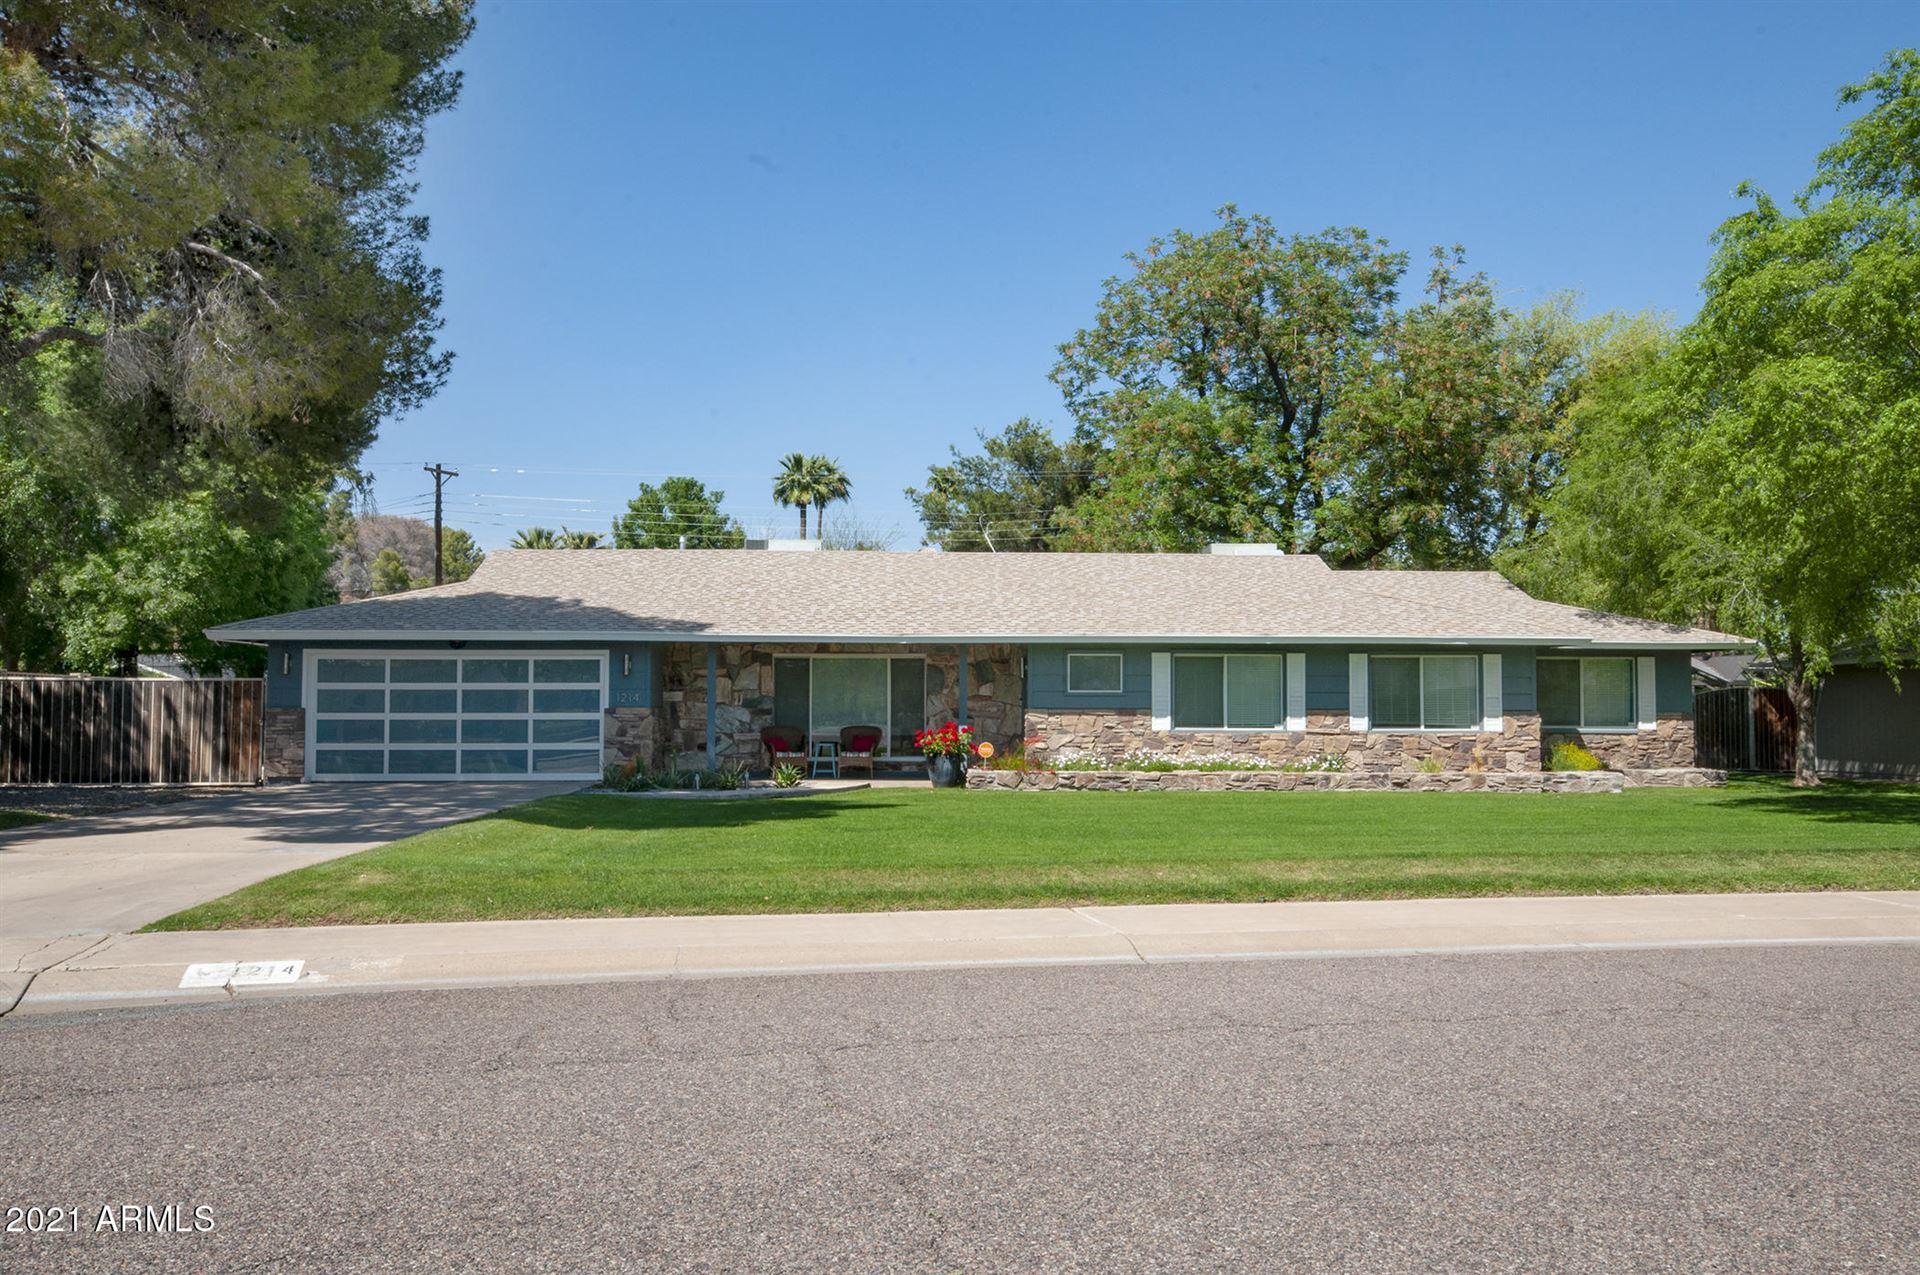 1214 W FRIER Drive, Phoenix, AZ 85021 - MLS#: 6194458